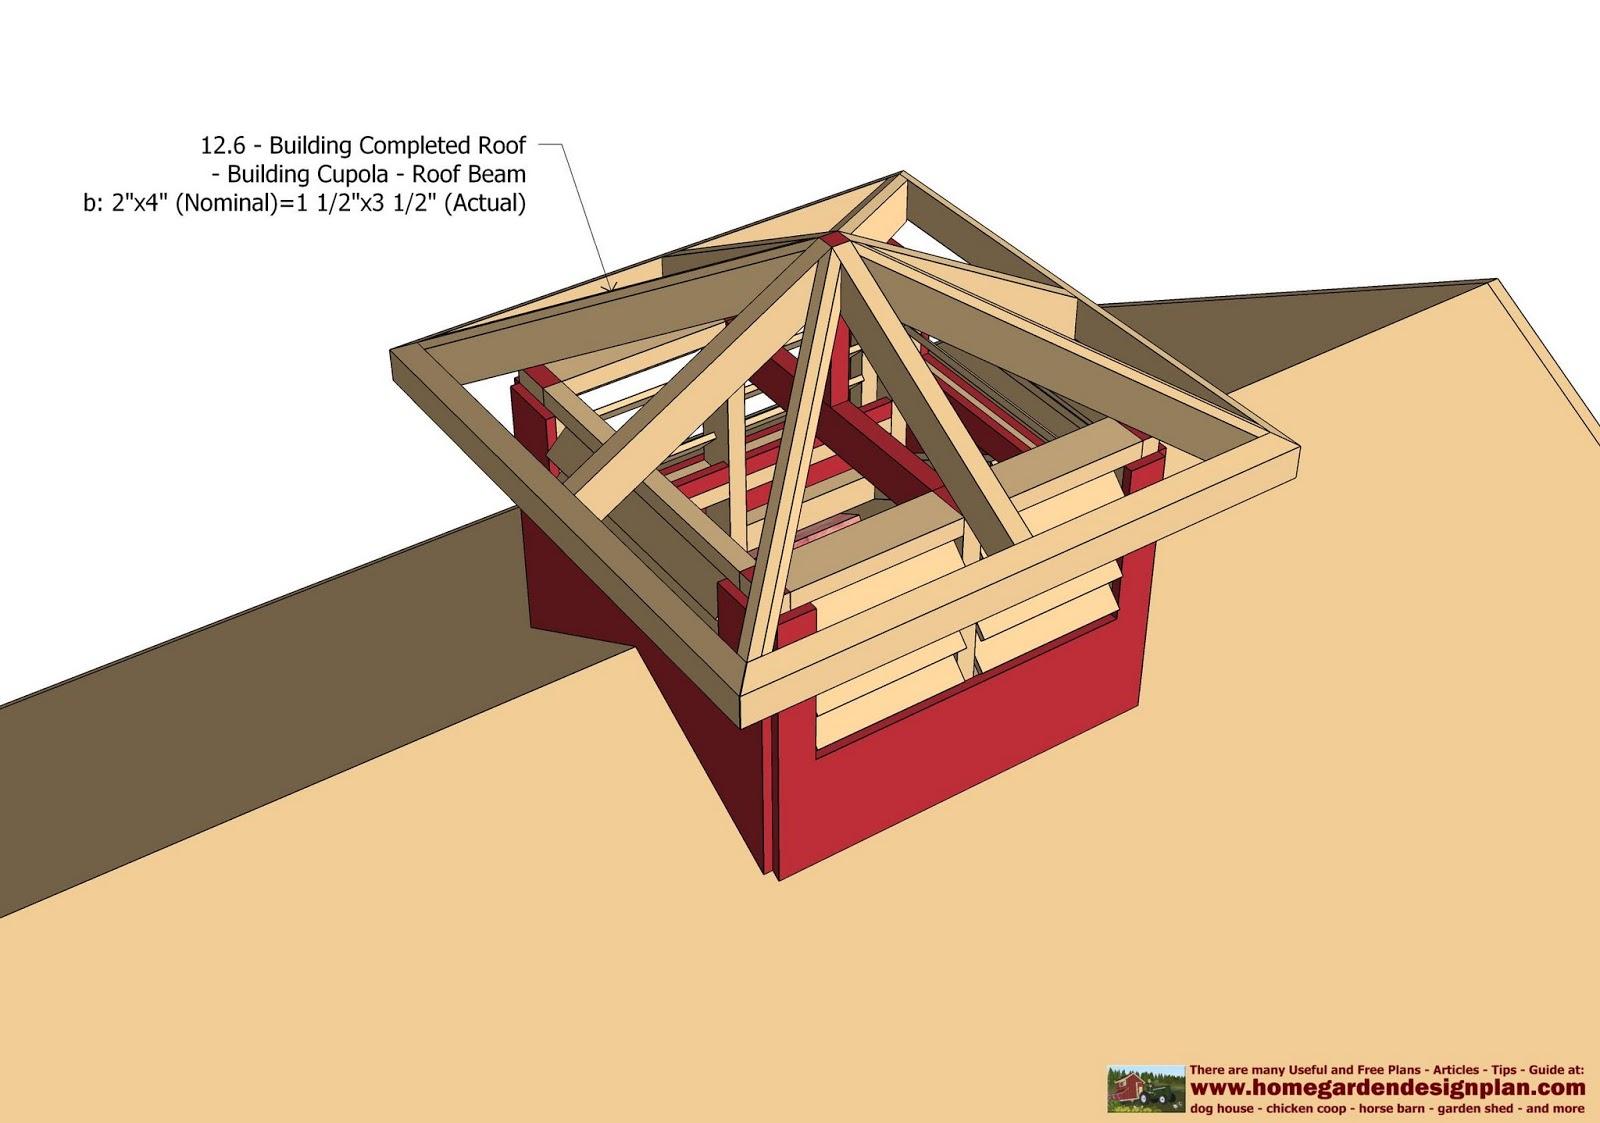 home garden plans CB211 Combo Chicken Coop Garden Shed Plans – Chicken Coop With Garden Roof Plans